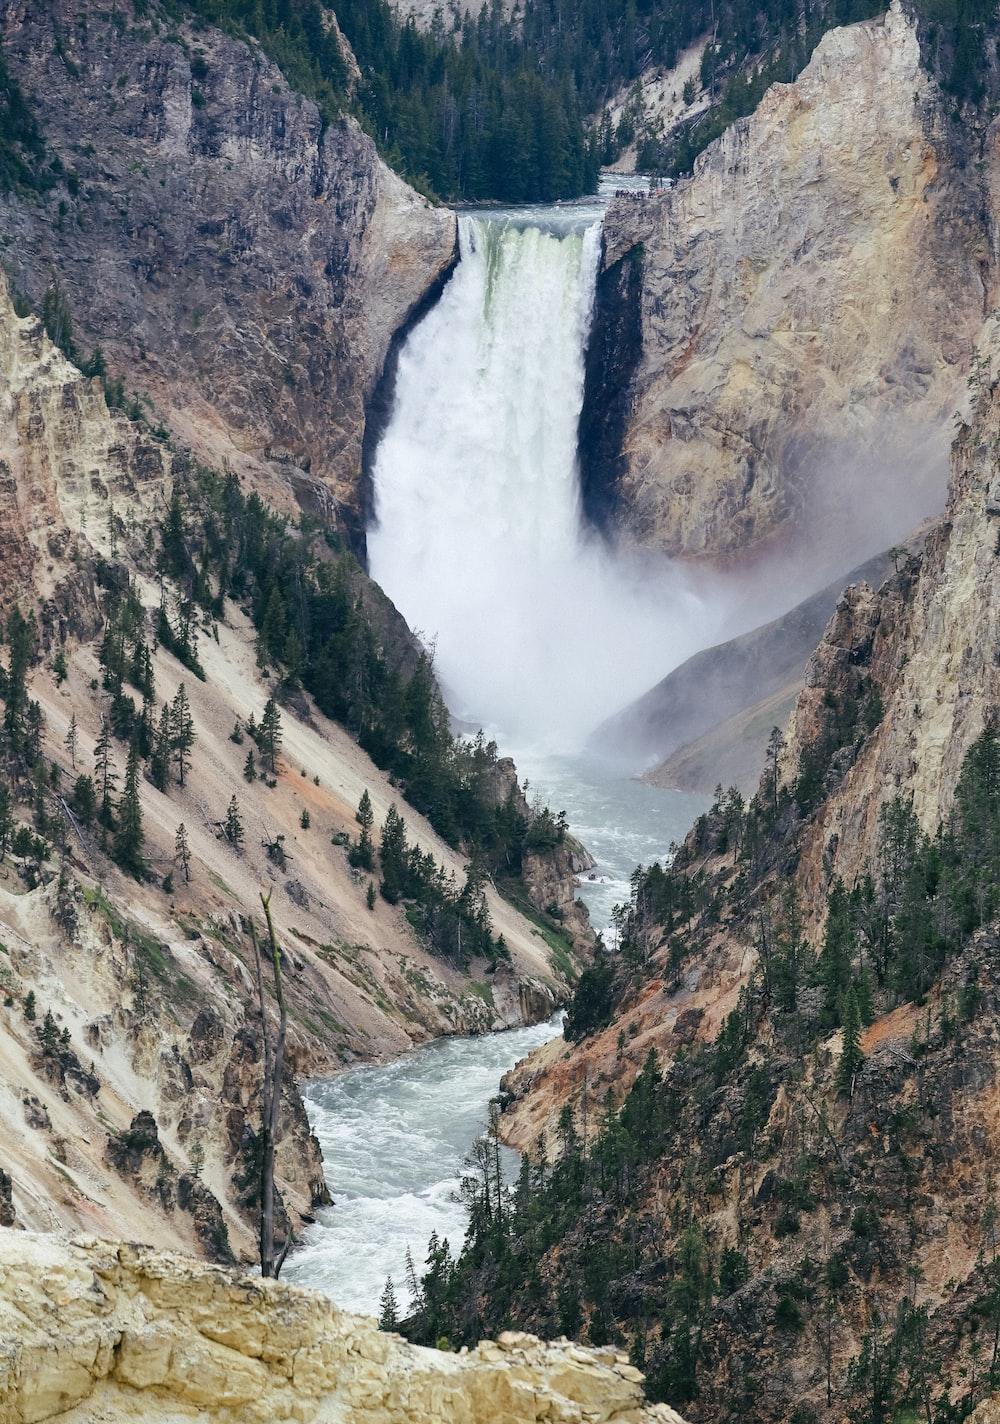 trees near waterfall